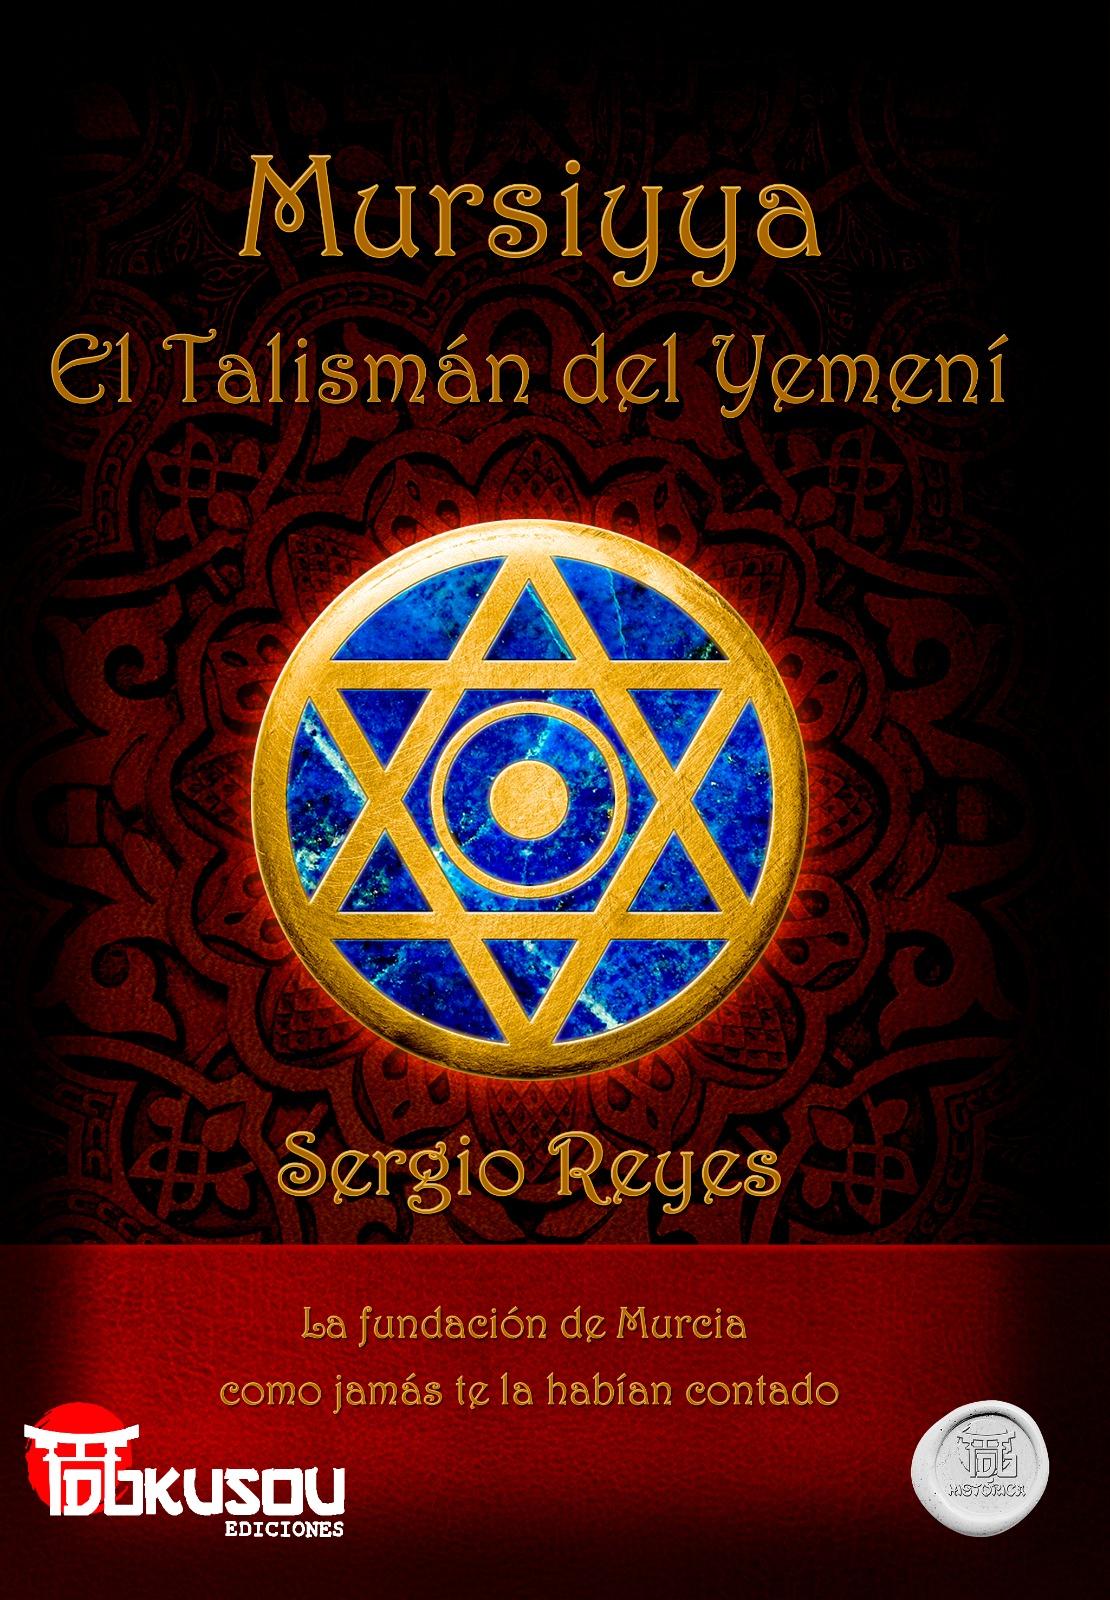 Mursiyya - El talismán del Yemení